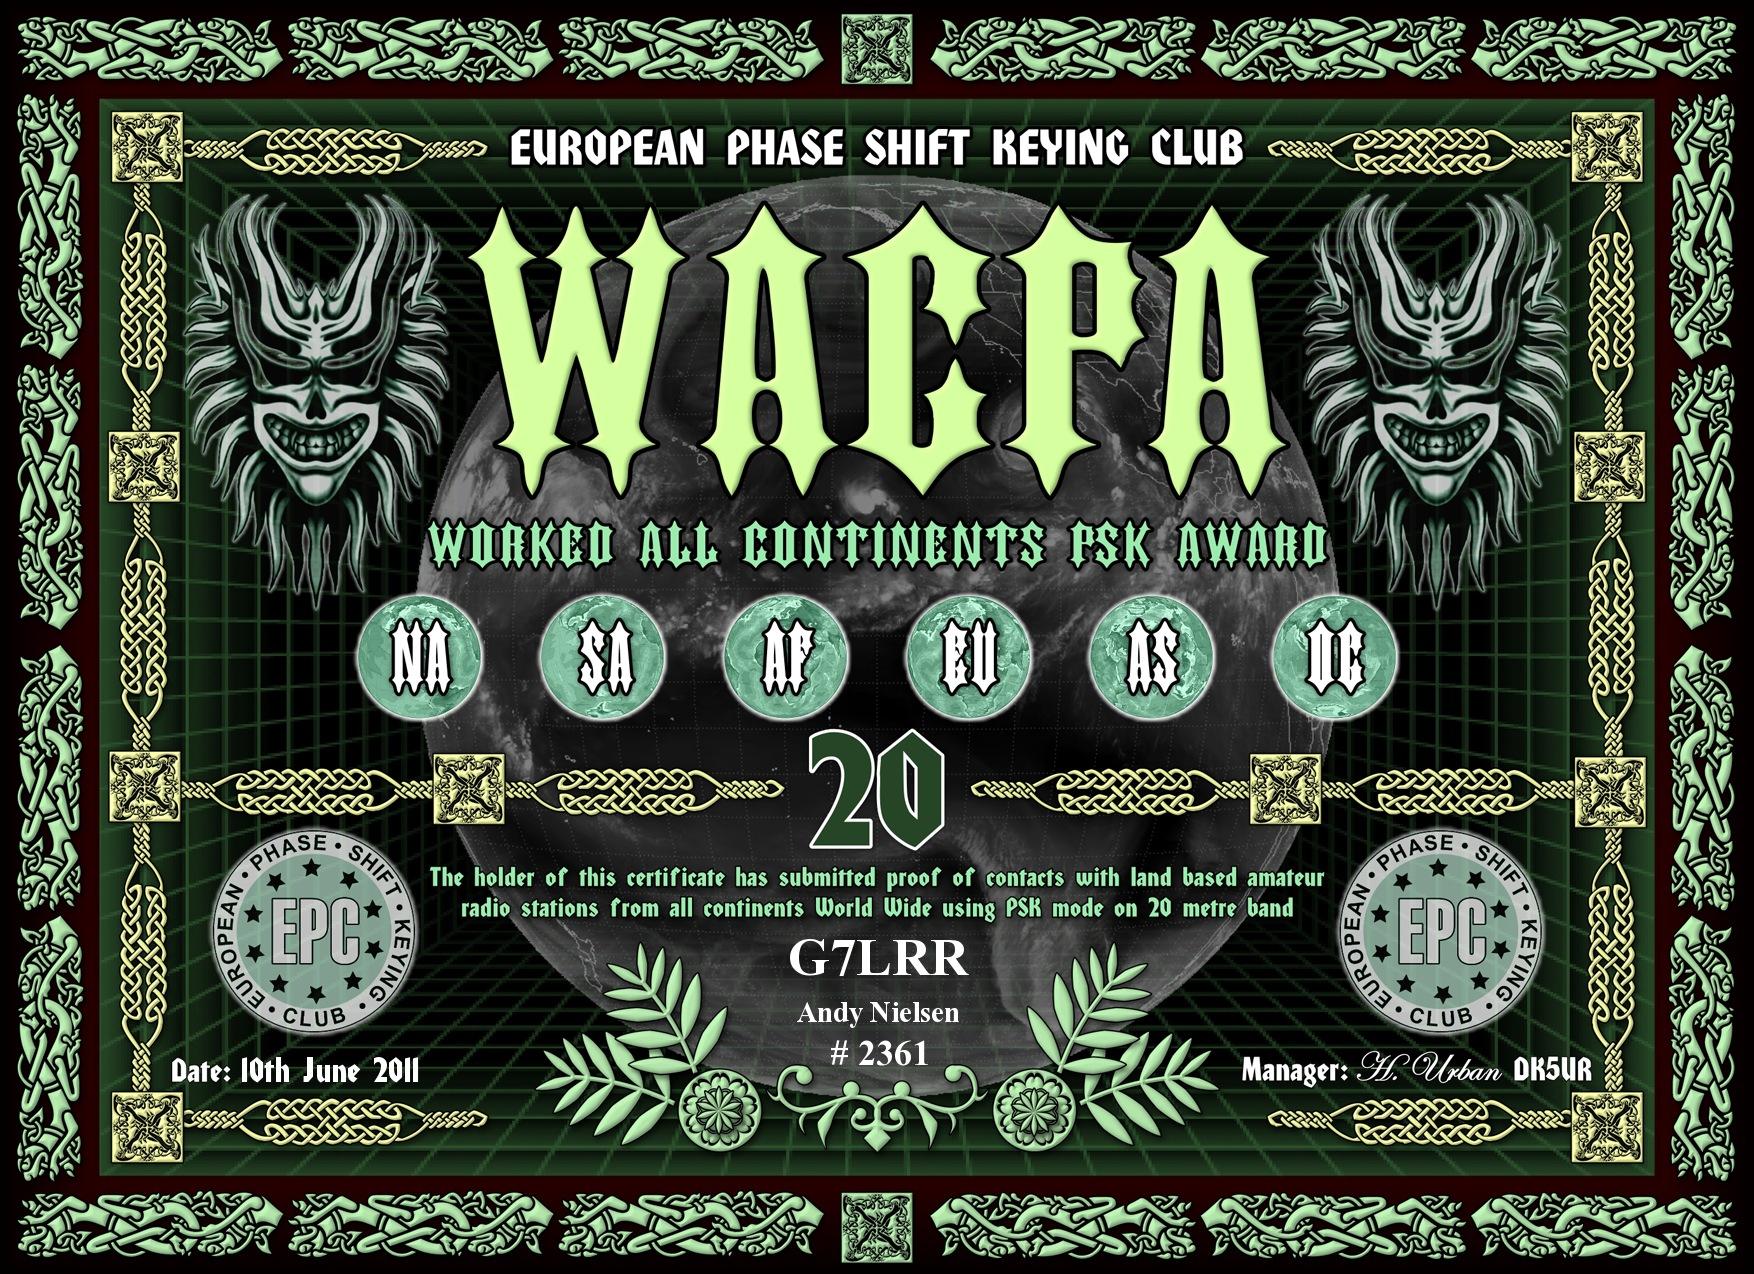 G7LRR_WACPA_20M